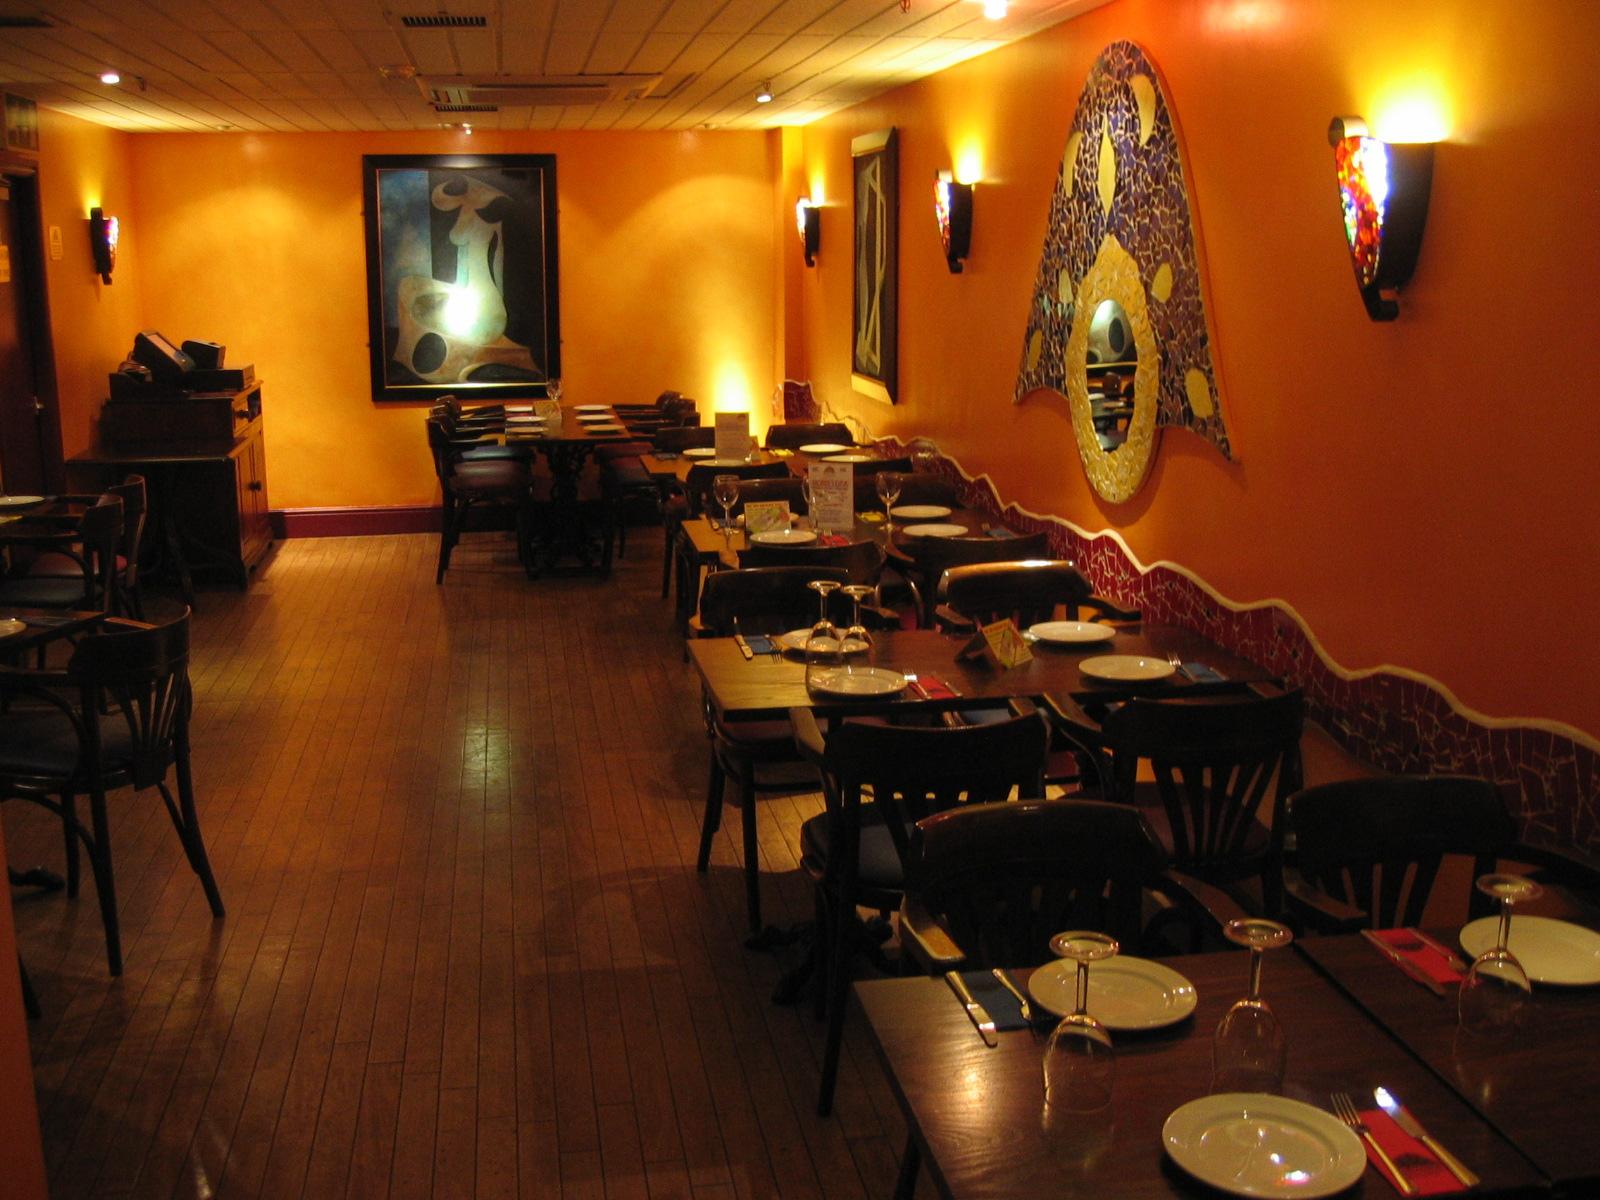 Barcelona Tapas Bar y Restaurante - Middlesex Street